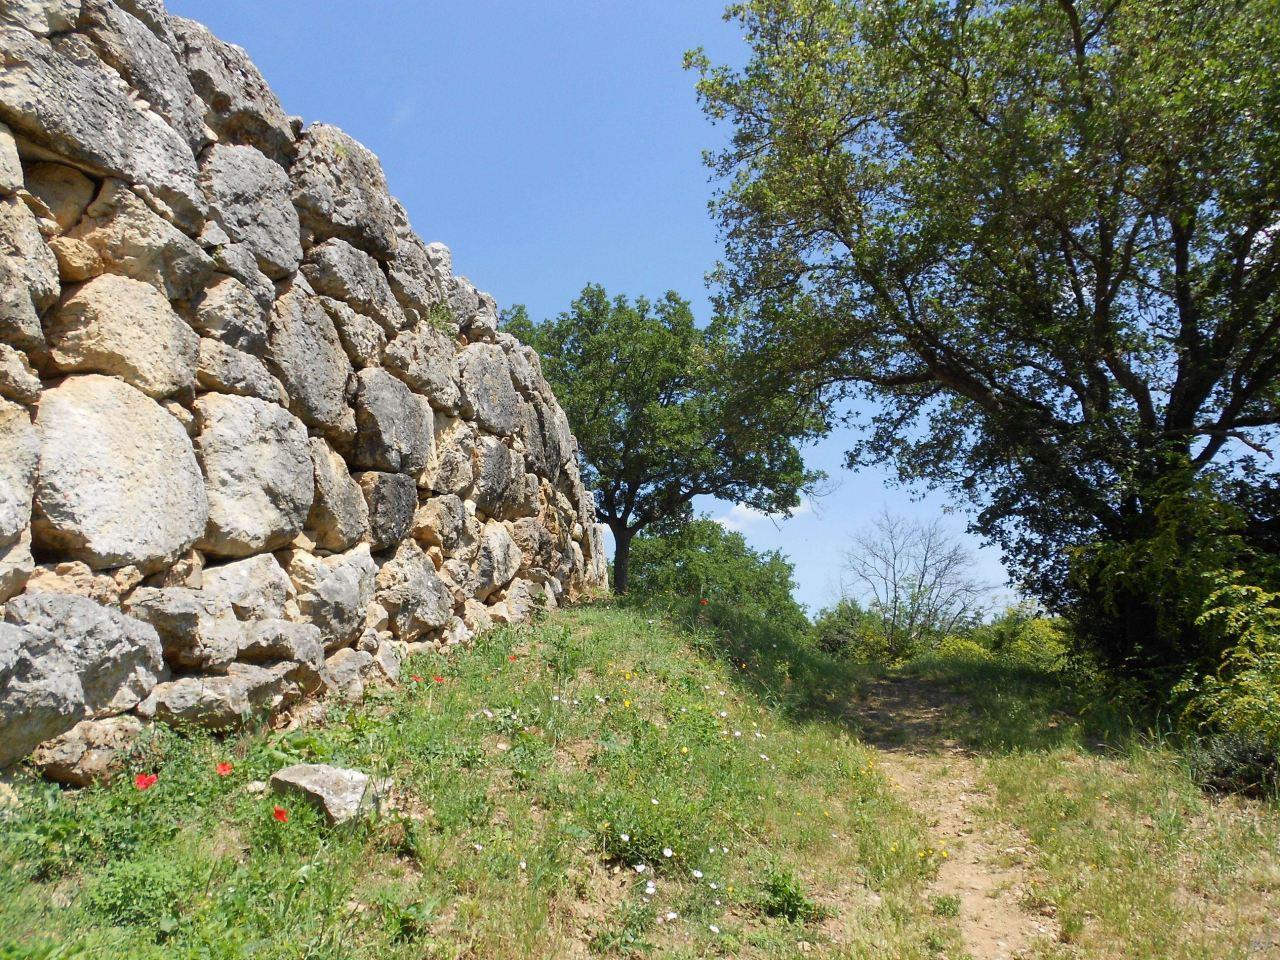 Roselle-Mura-Megalitiche-Roselle-Grosseto-Toscana-Italia-5